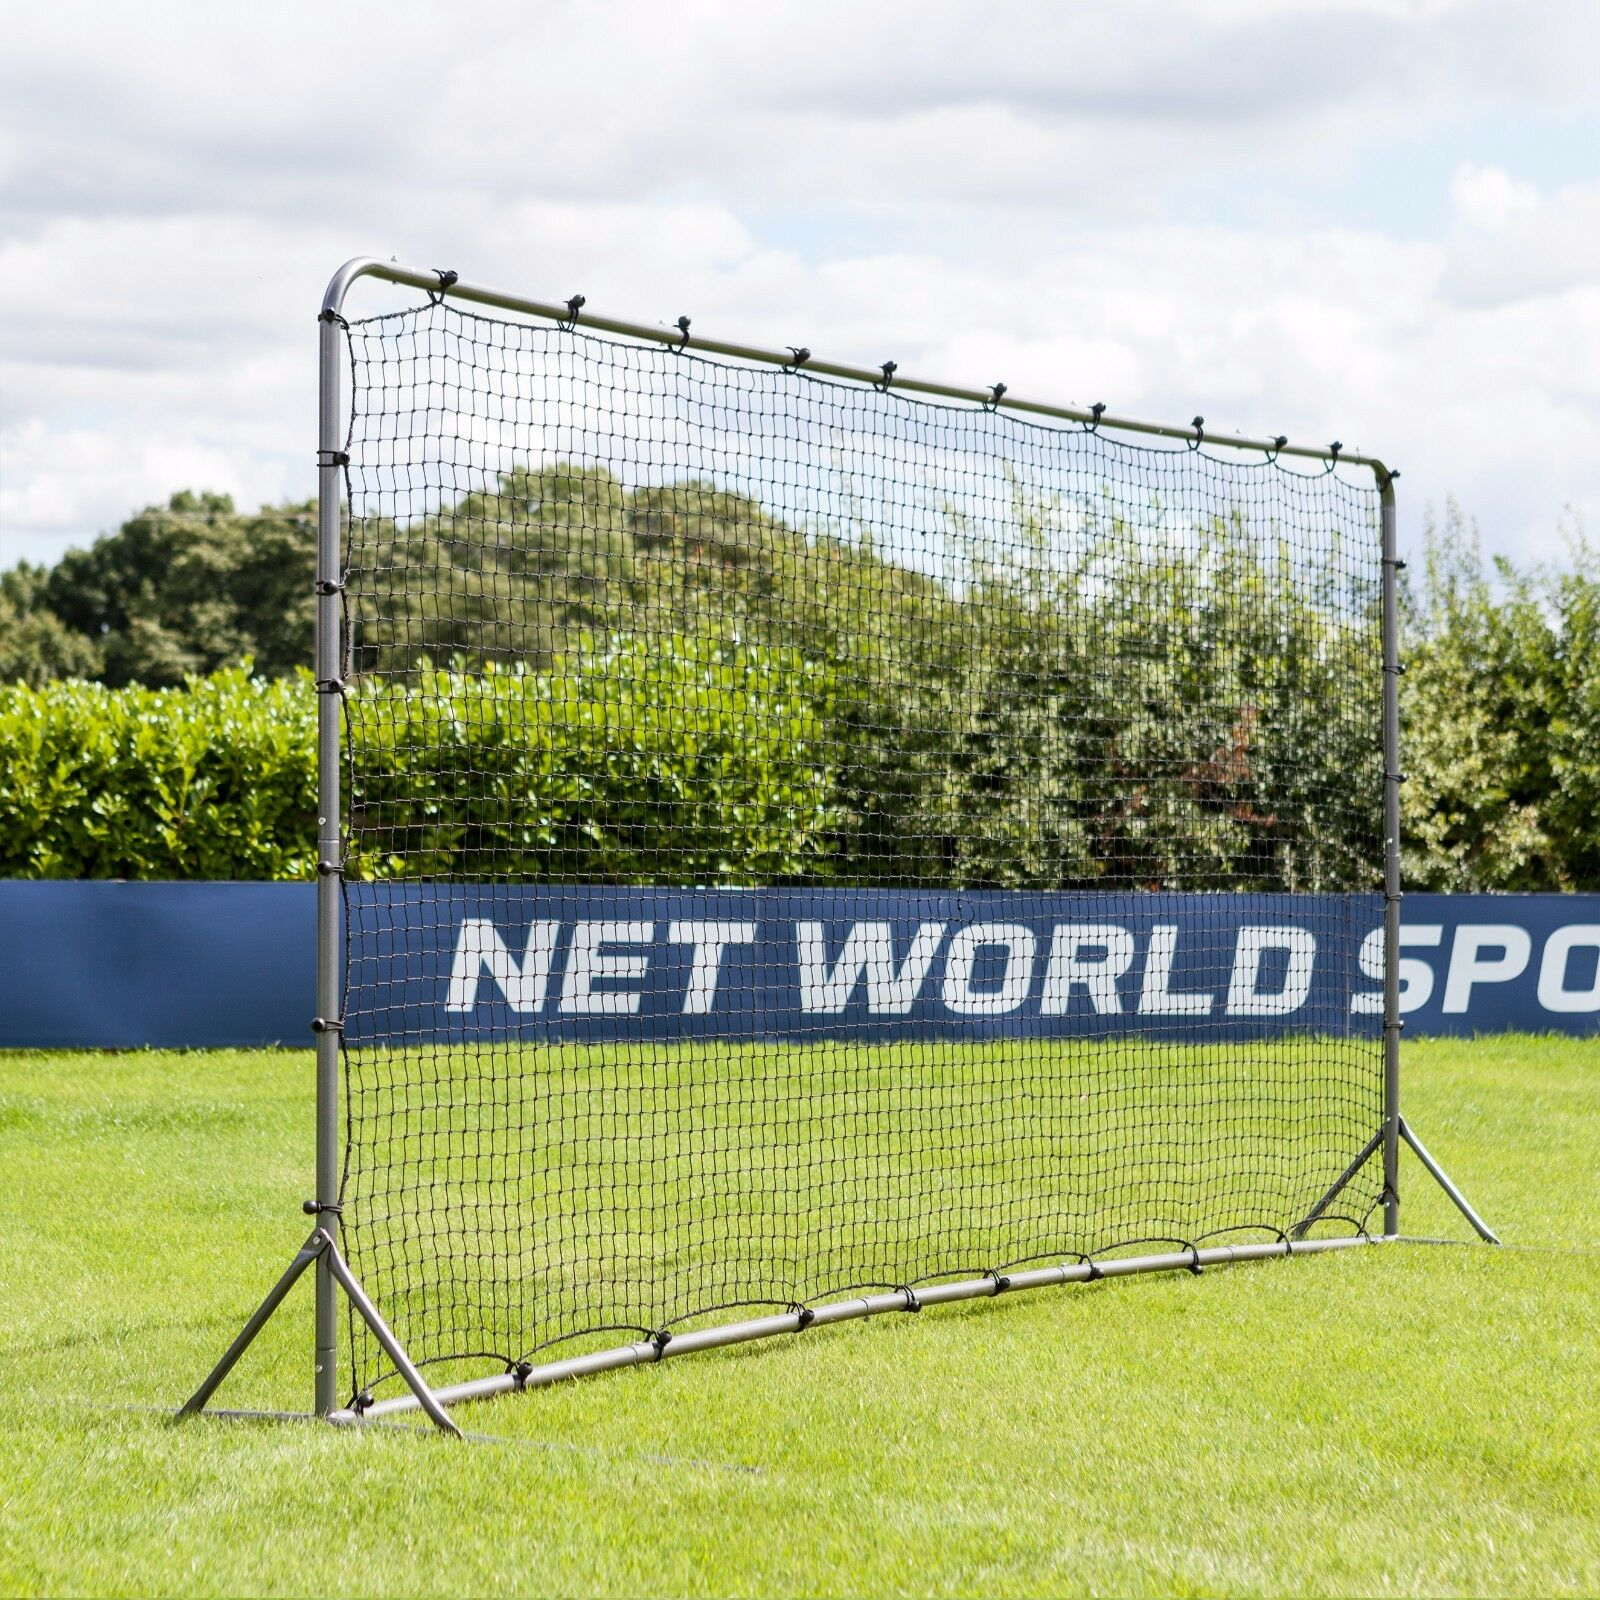 Forza fútbol parojo de rebote (12 ft (approx. 3.66 m) X 6 ft (approx. 1.83 m) 16 ft (approx. 4.88 m) X 7 ft (approx. 2.13 m)) [Net World Sports]